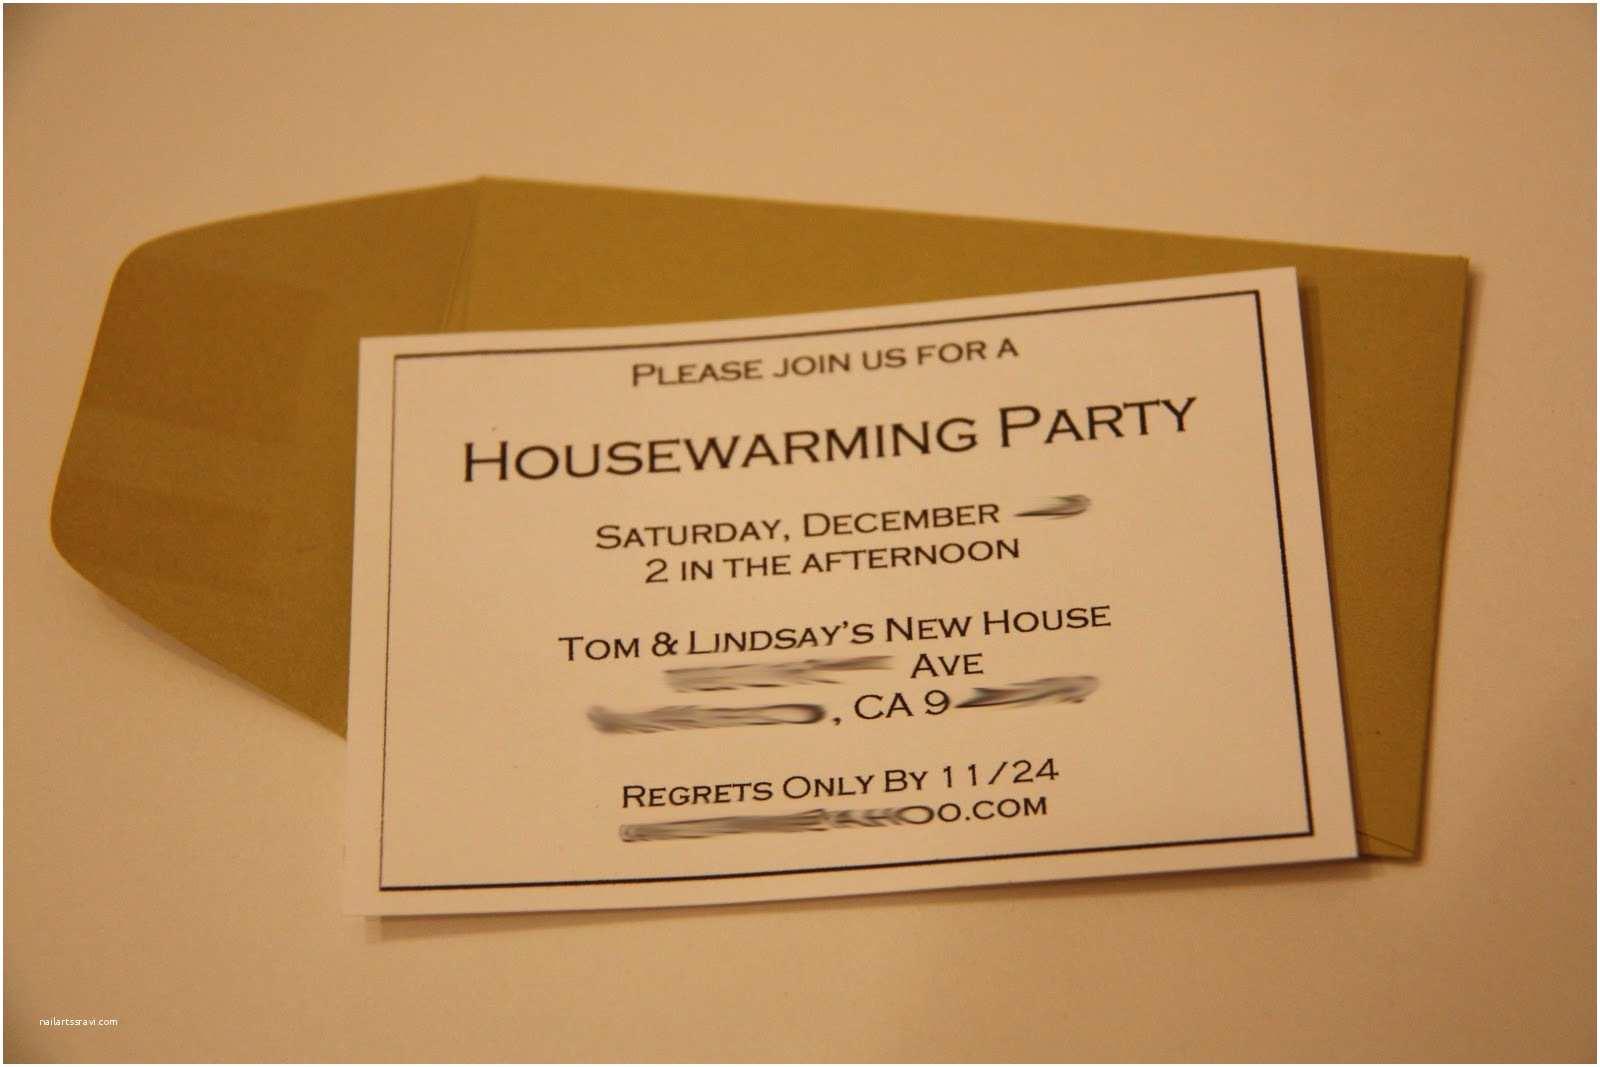 /housewarming/housewarming Invitations Free Housewarming Party Invitation – Gangcraft